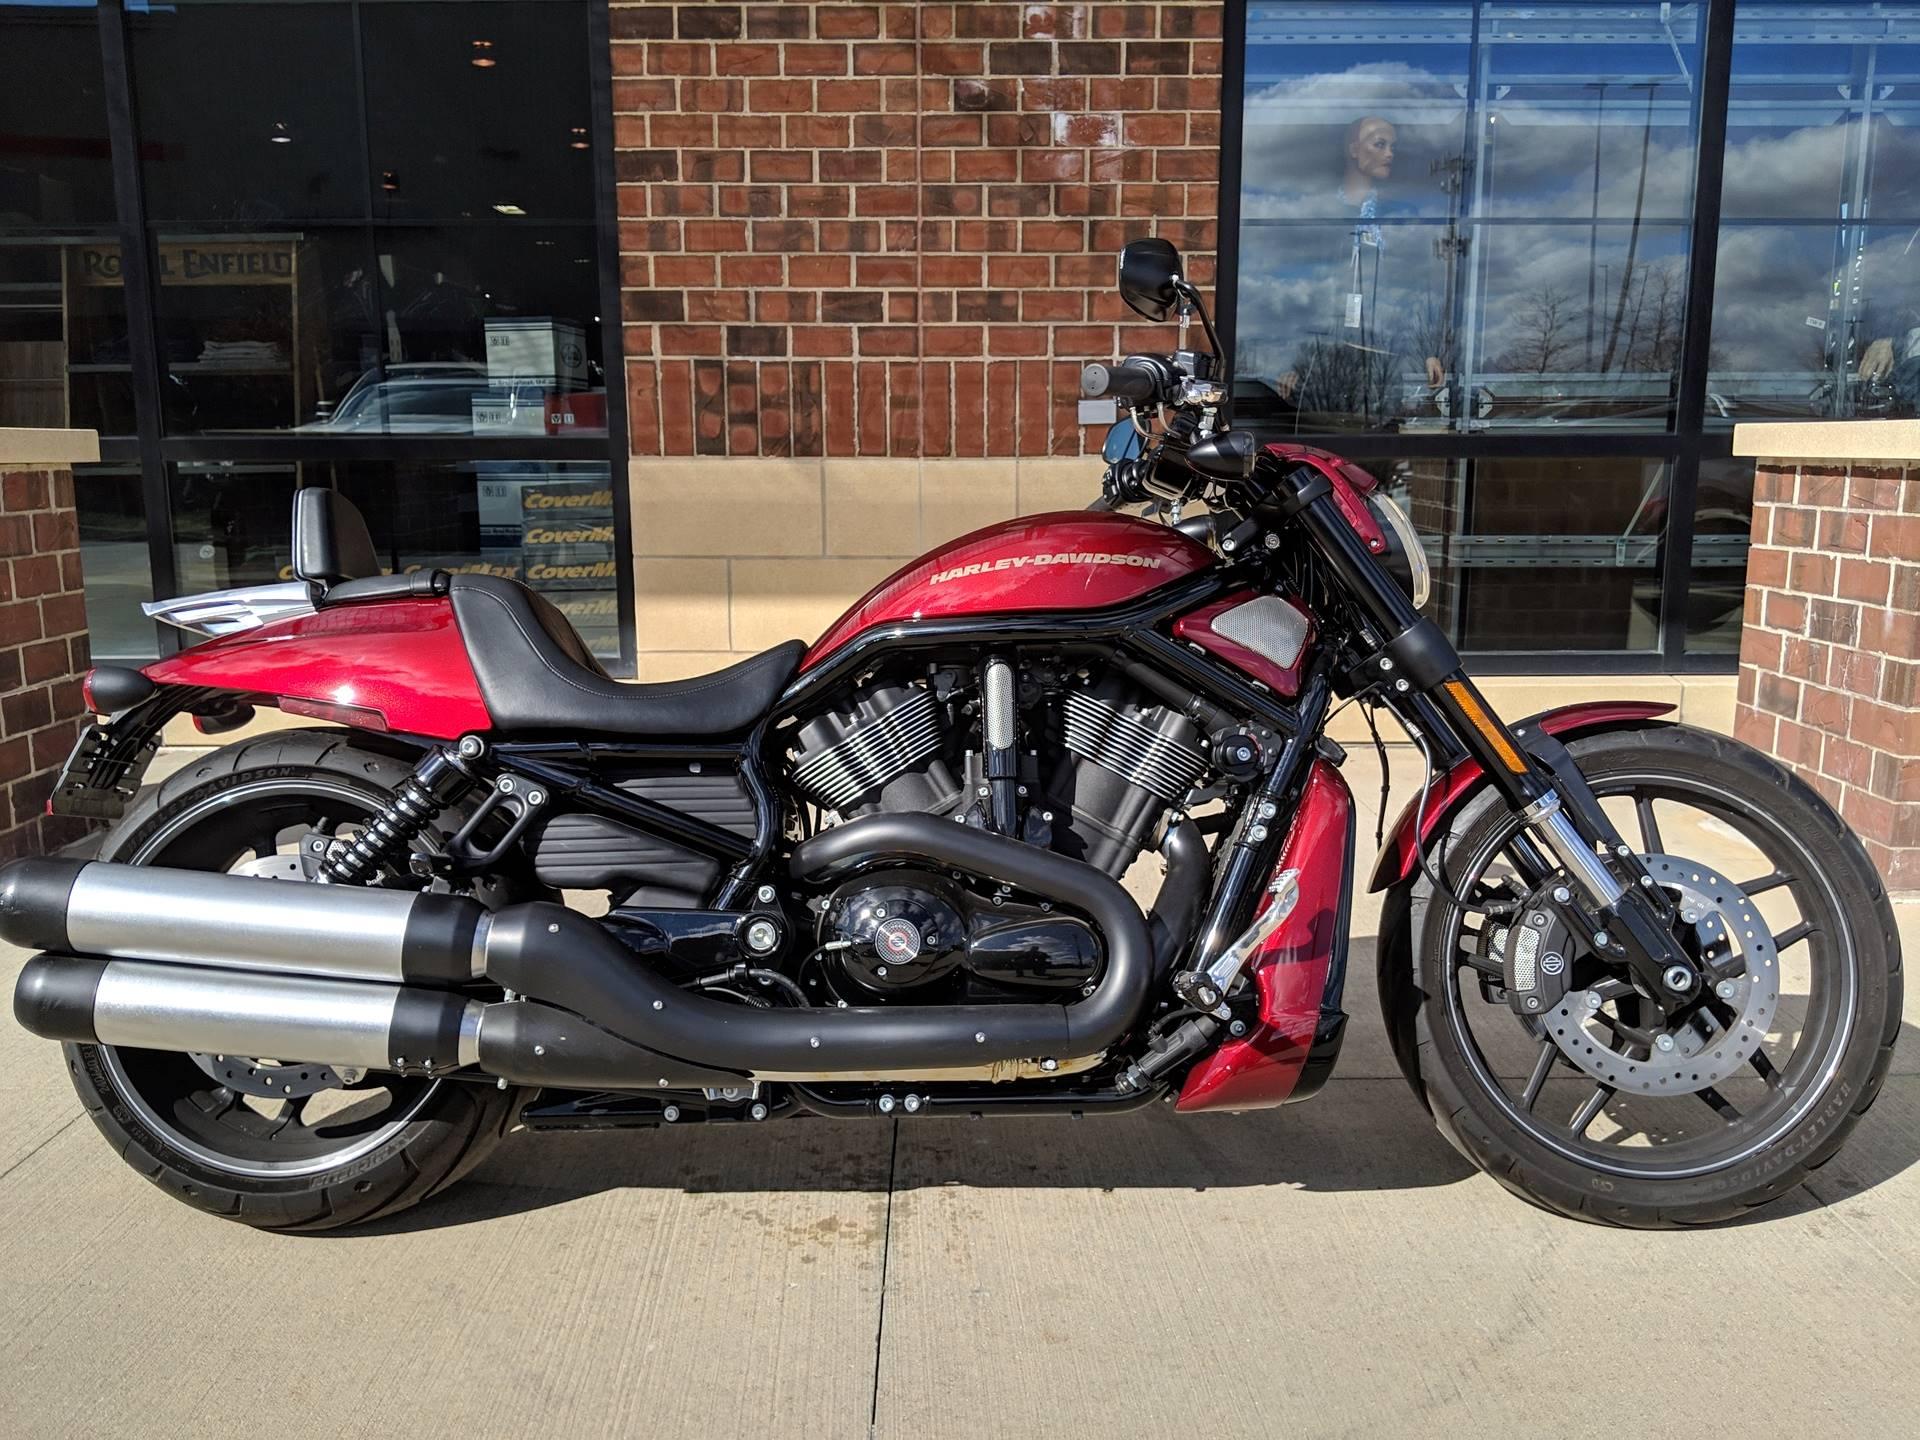 2016 Harley Davidson Night Rod Special In Saint Charles Illinois